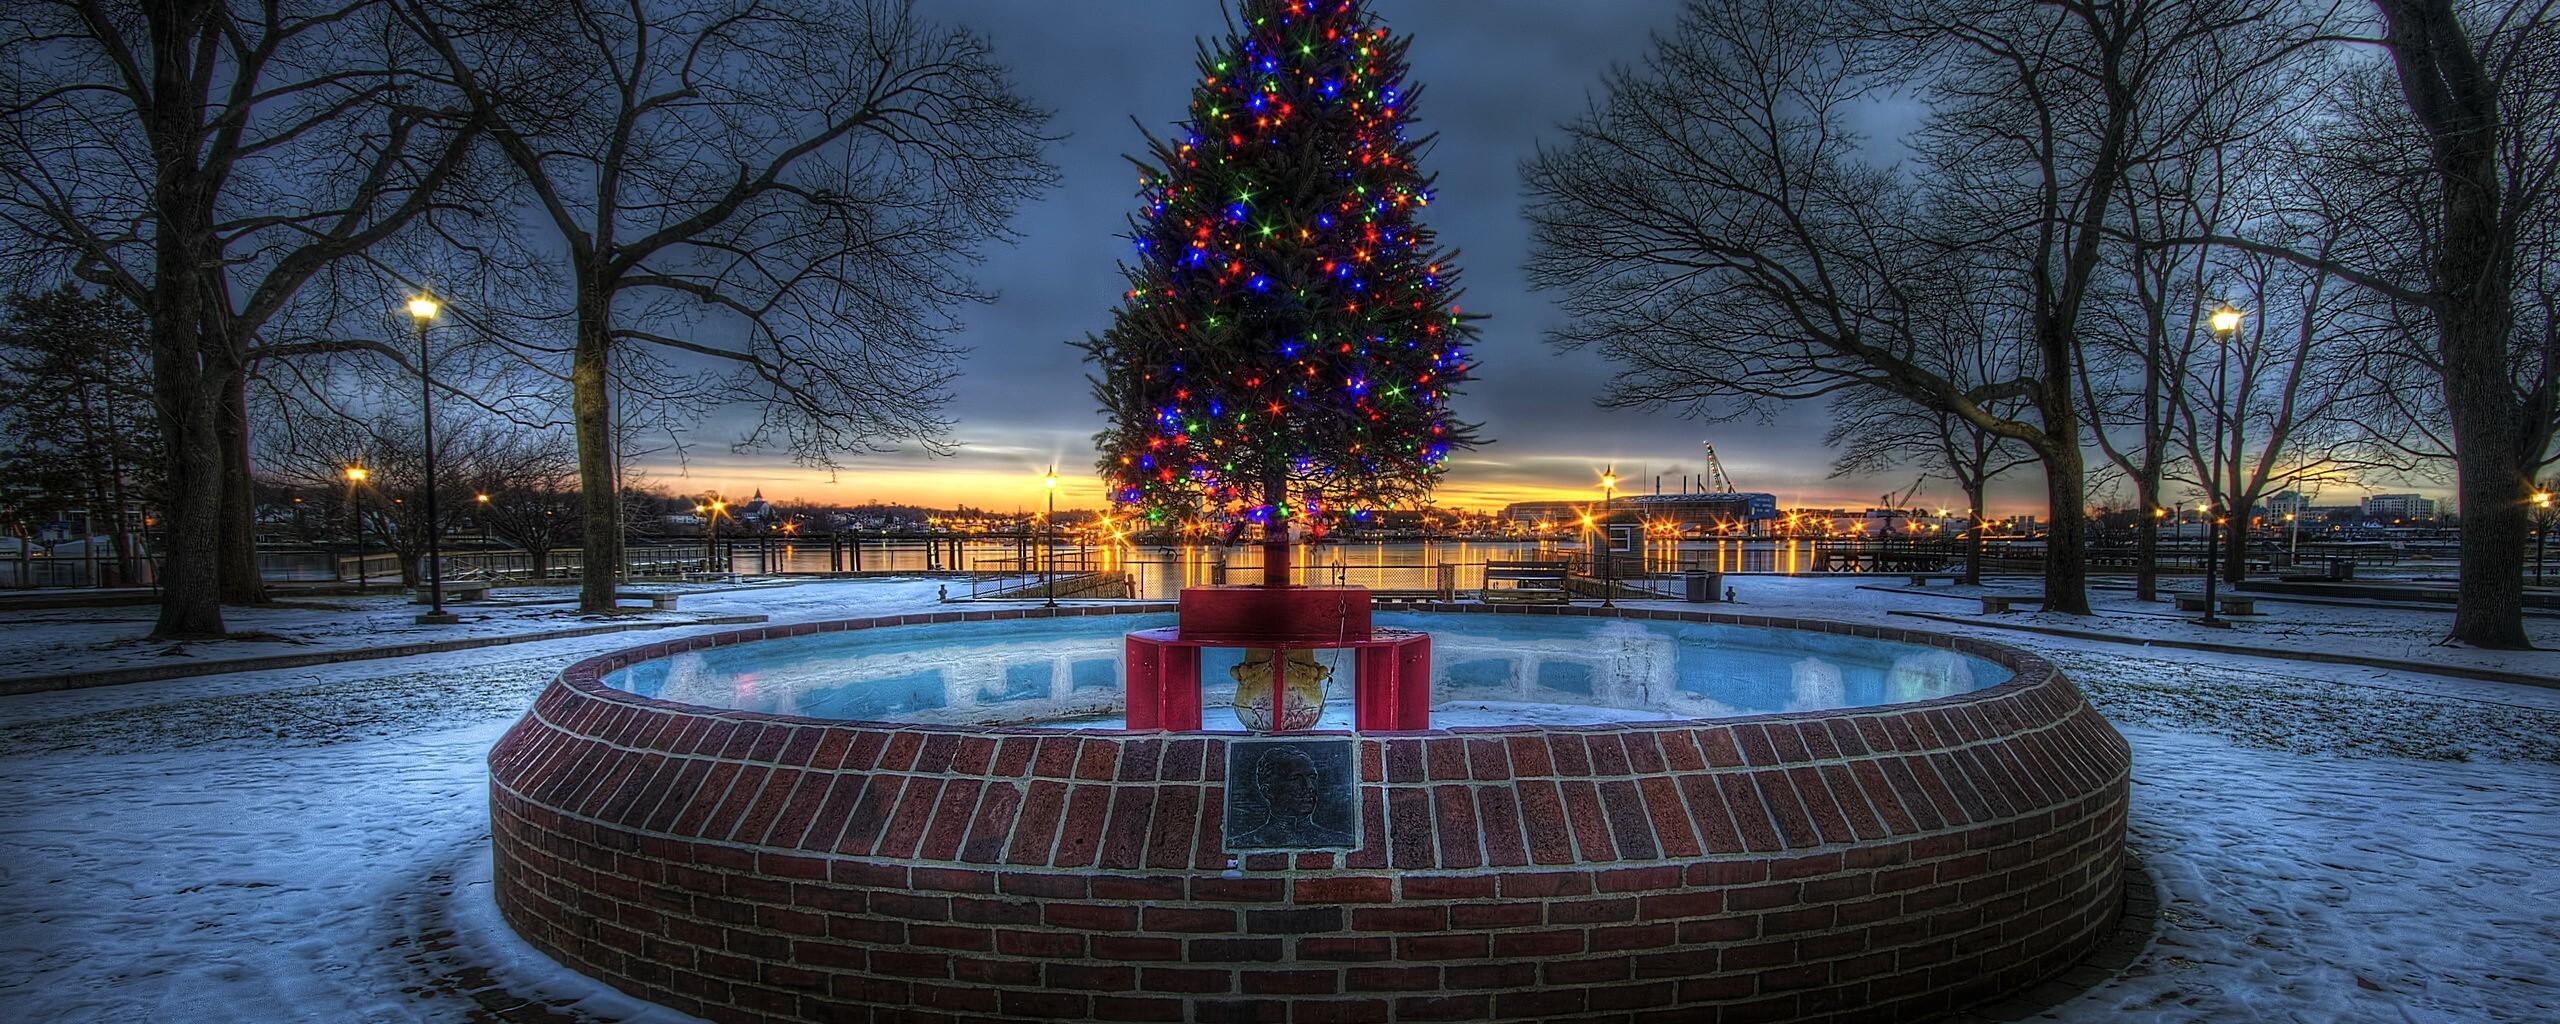 lighted-christmas-tree-8b.jpg